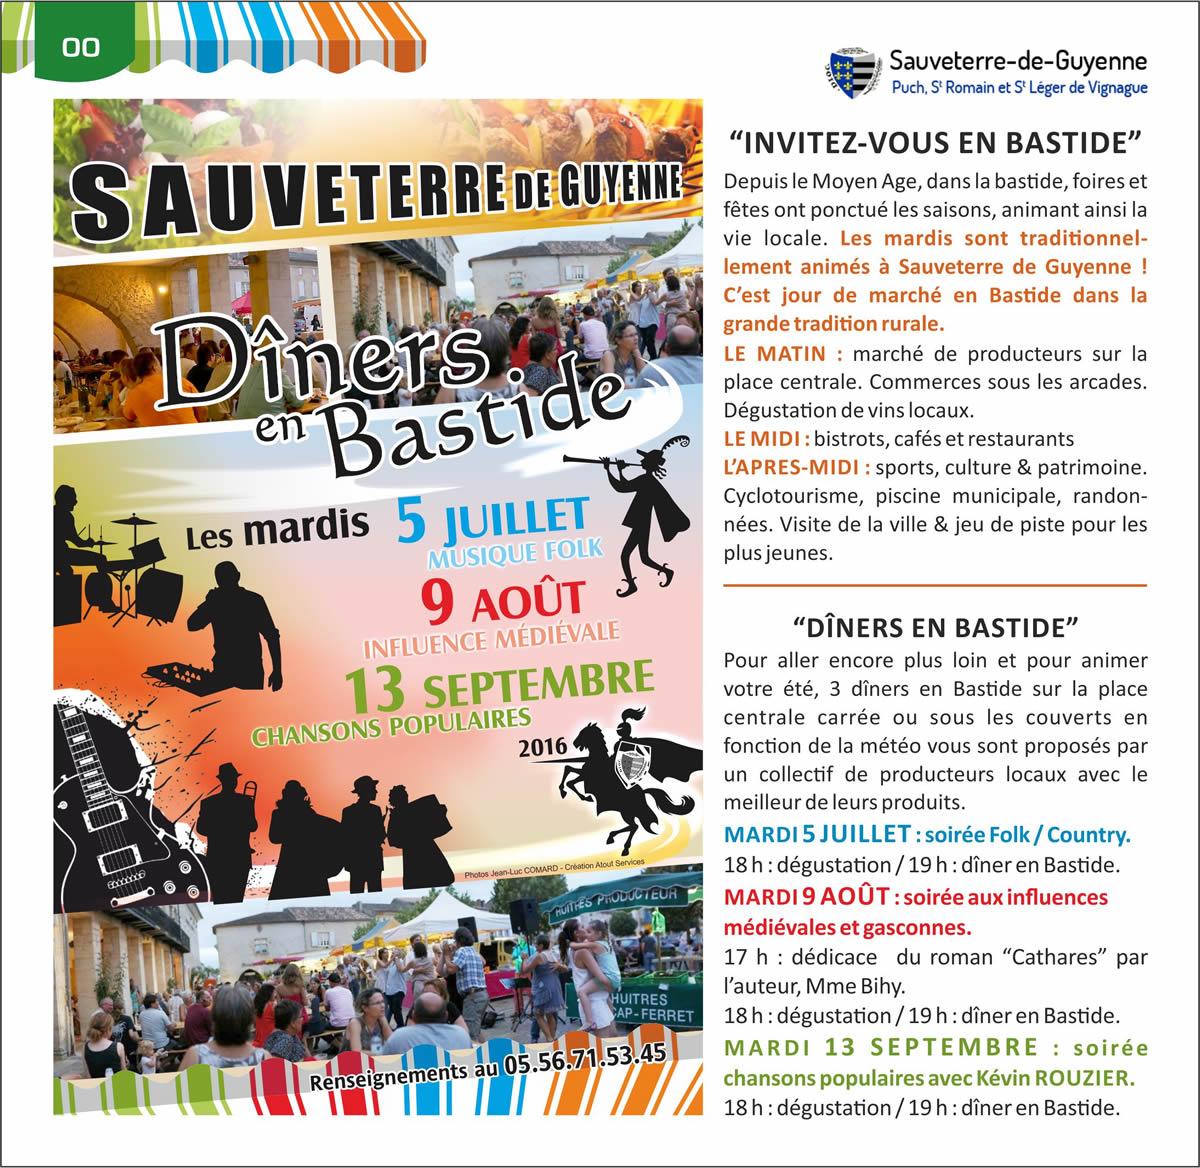 Dîners en Bastide - Sauveterre-de-Guyenne - Bastide Gironde